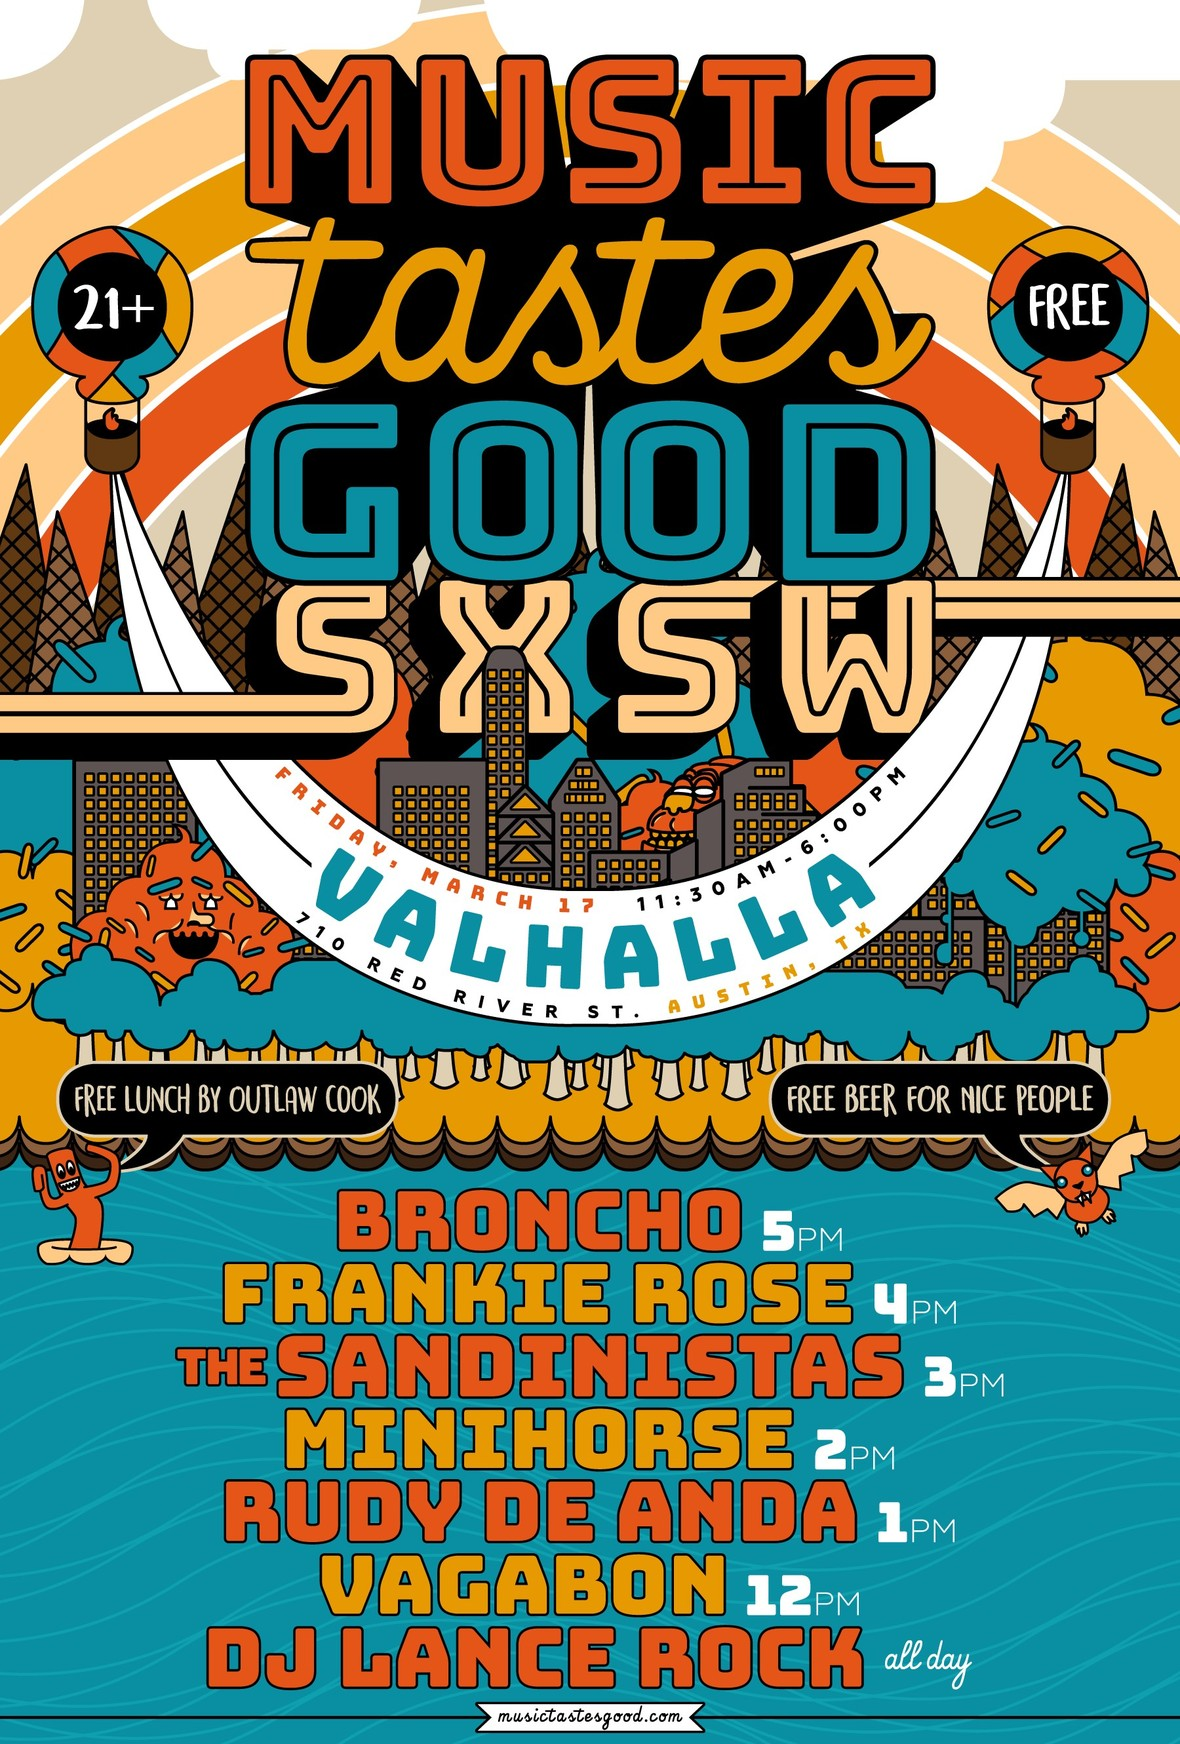 music tastes good sxsw 2017 flyer use this one